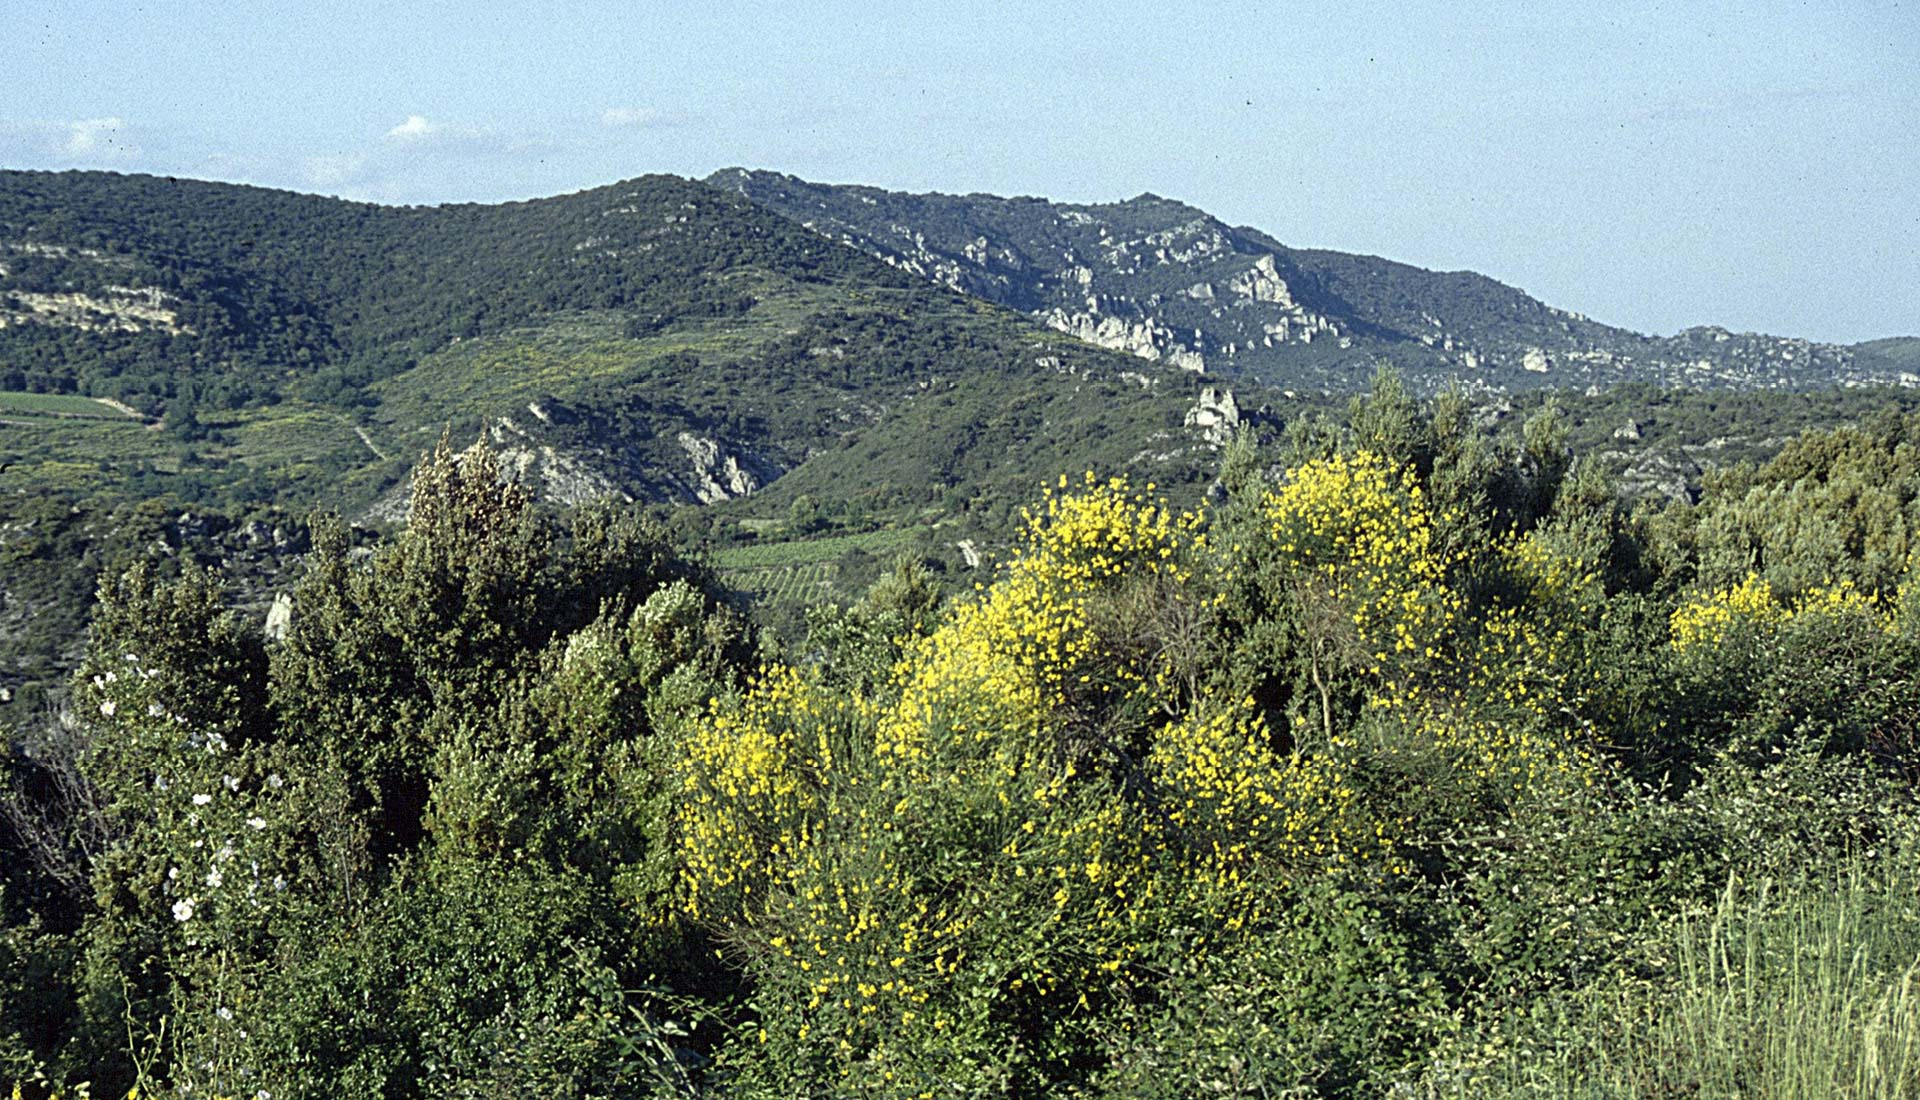 Montagne de Liausson Ziegler175 Wikimedia / CreativeCommons